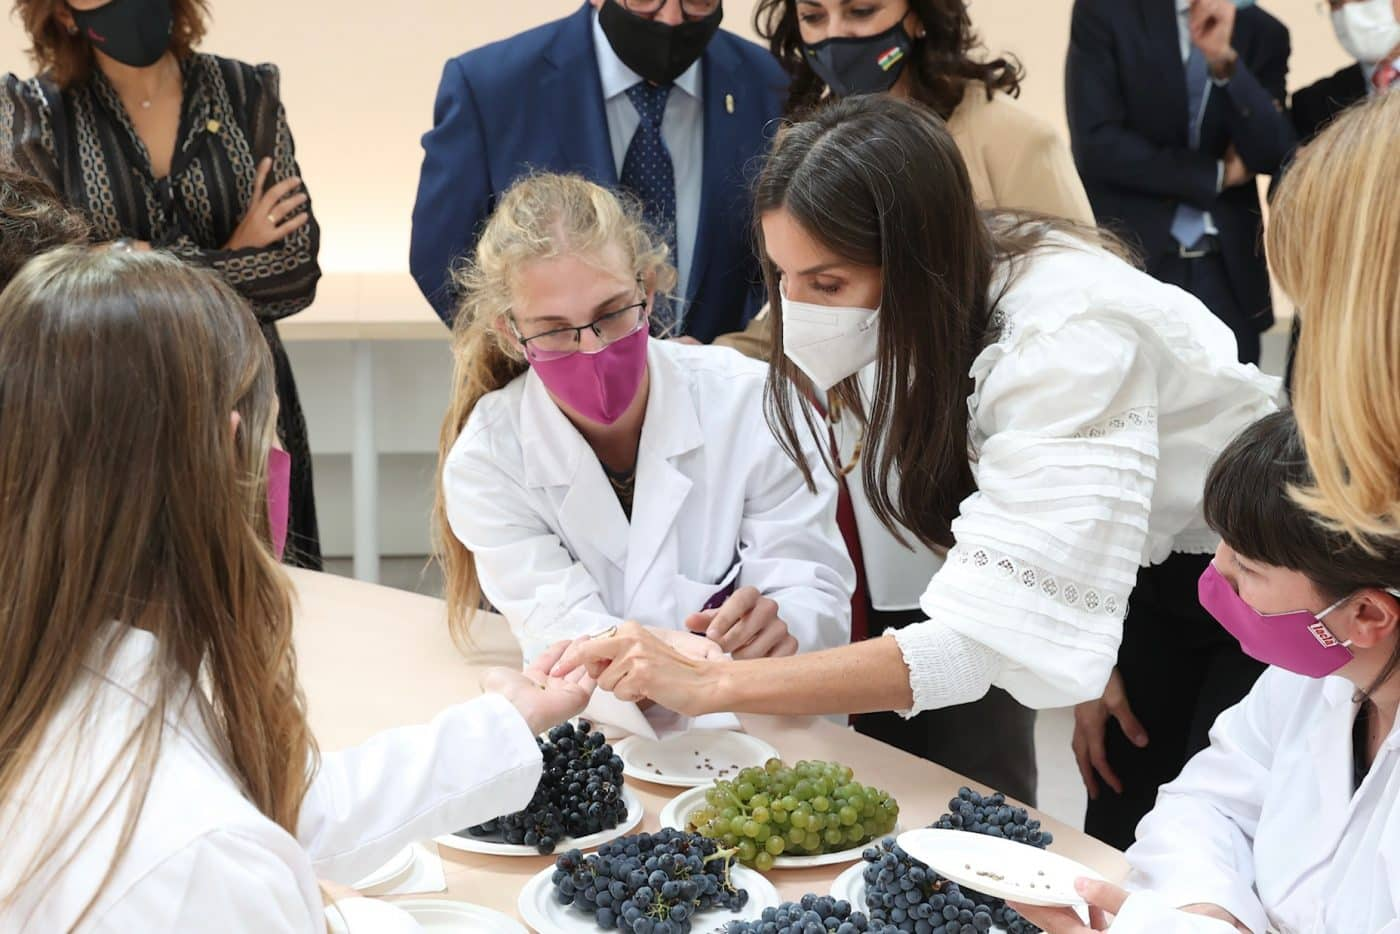 La reina Letizia preside en Haro la apertura del curso de FP 15